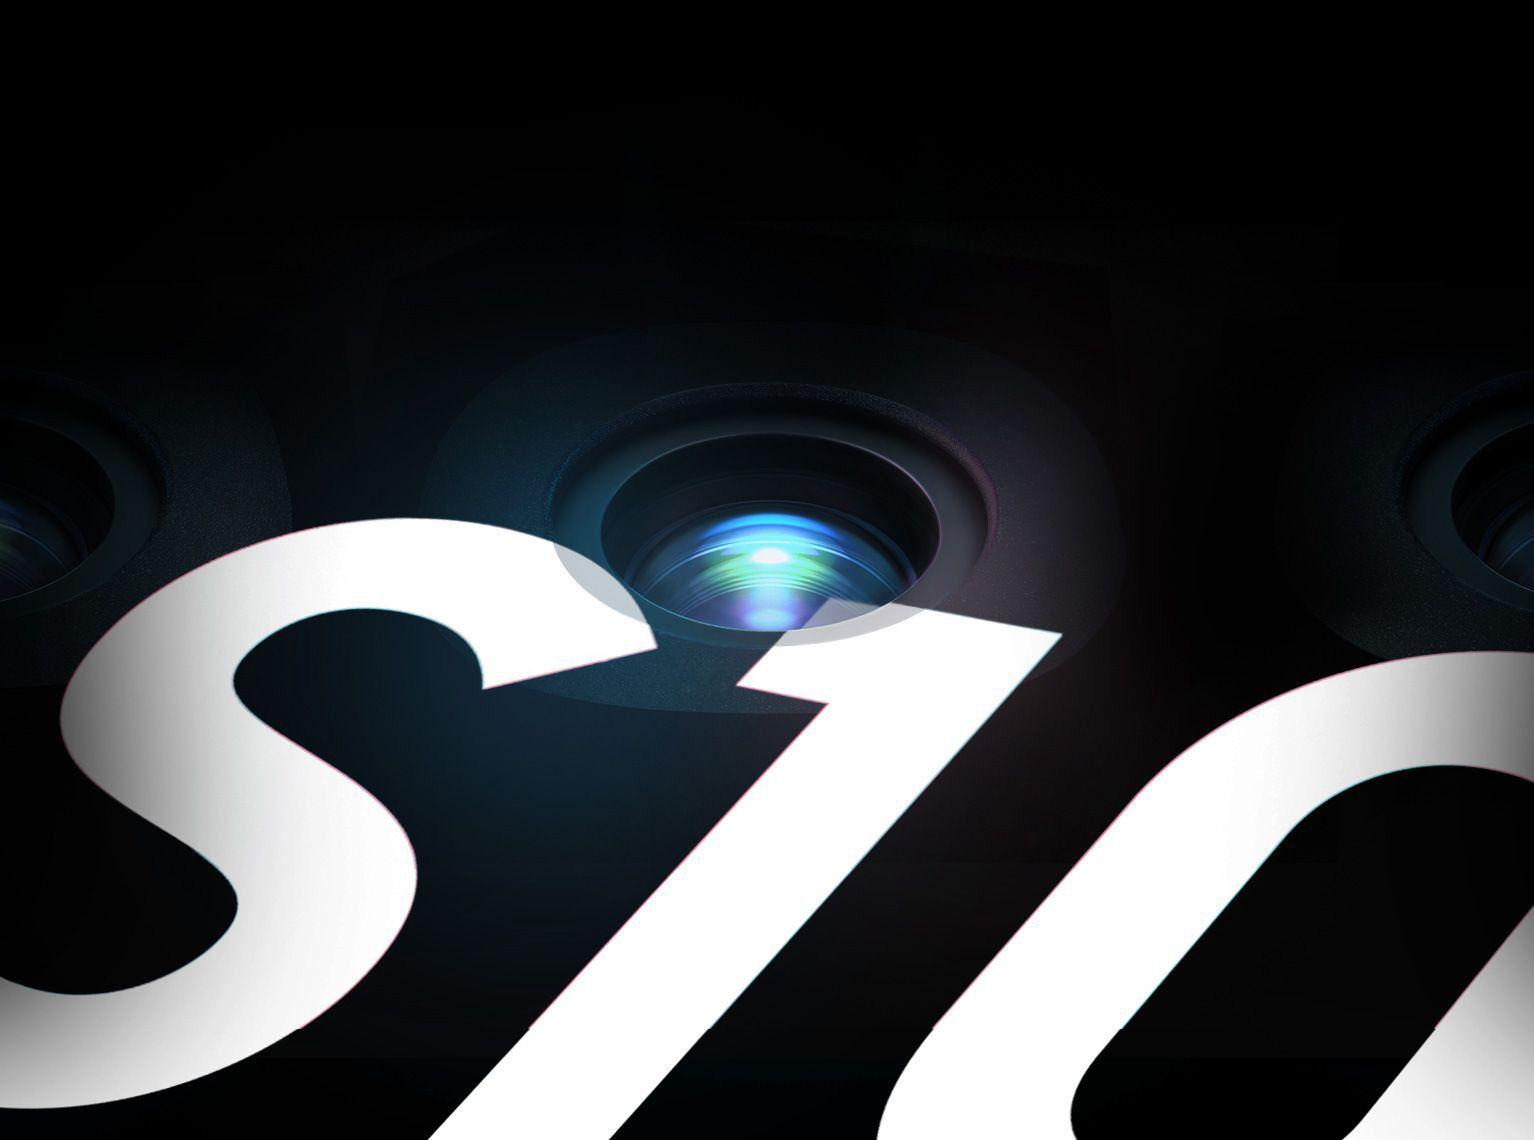 Samsung Galaxy S10 Camera - Pro-Grade, Ultra-Wide Lens | Samsung US